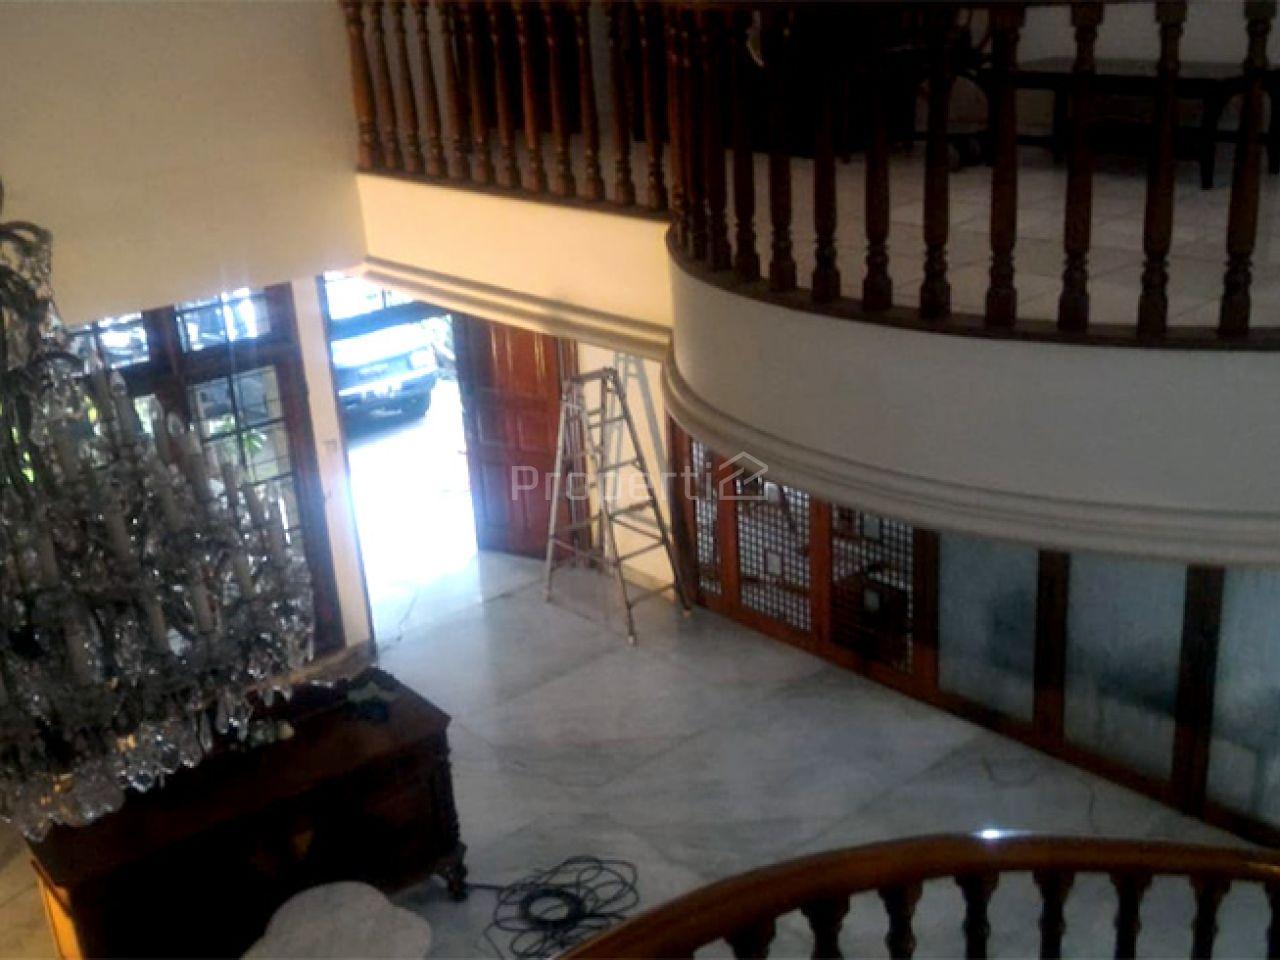 2 Storey House in Menteng, Central Jakarta, Jakarta Pusat